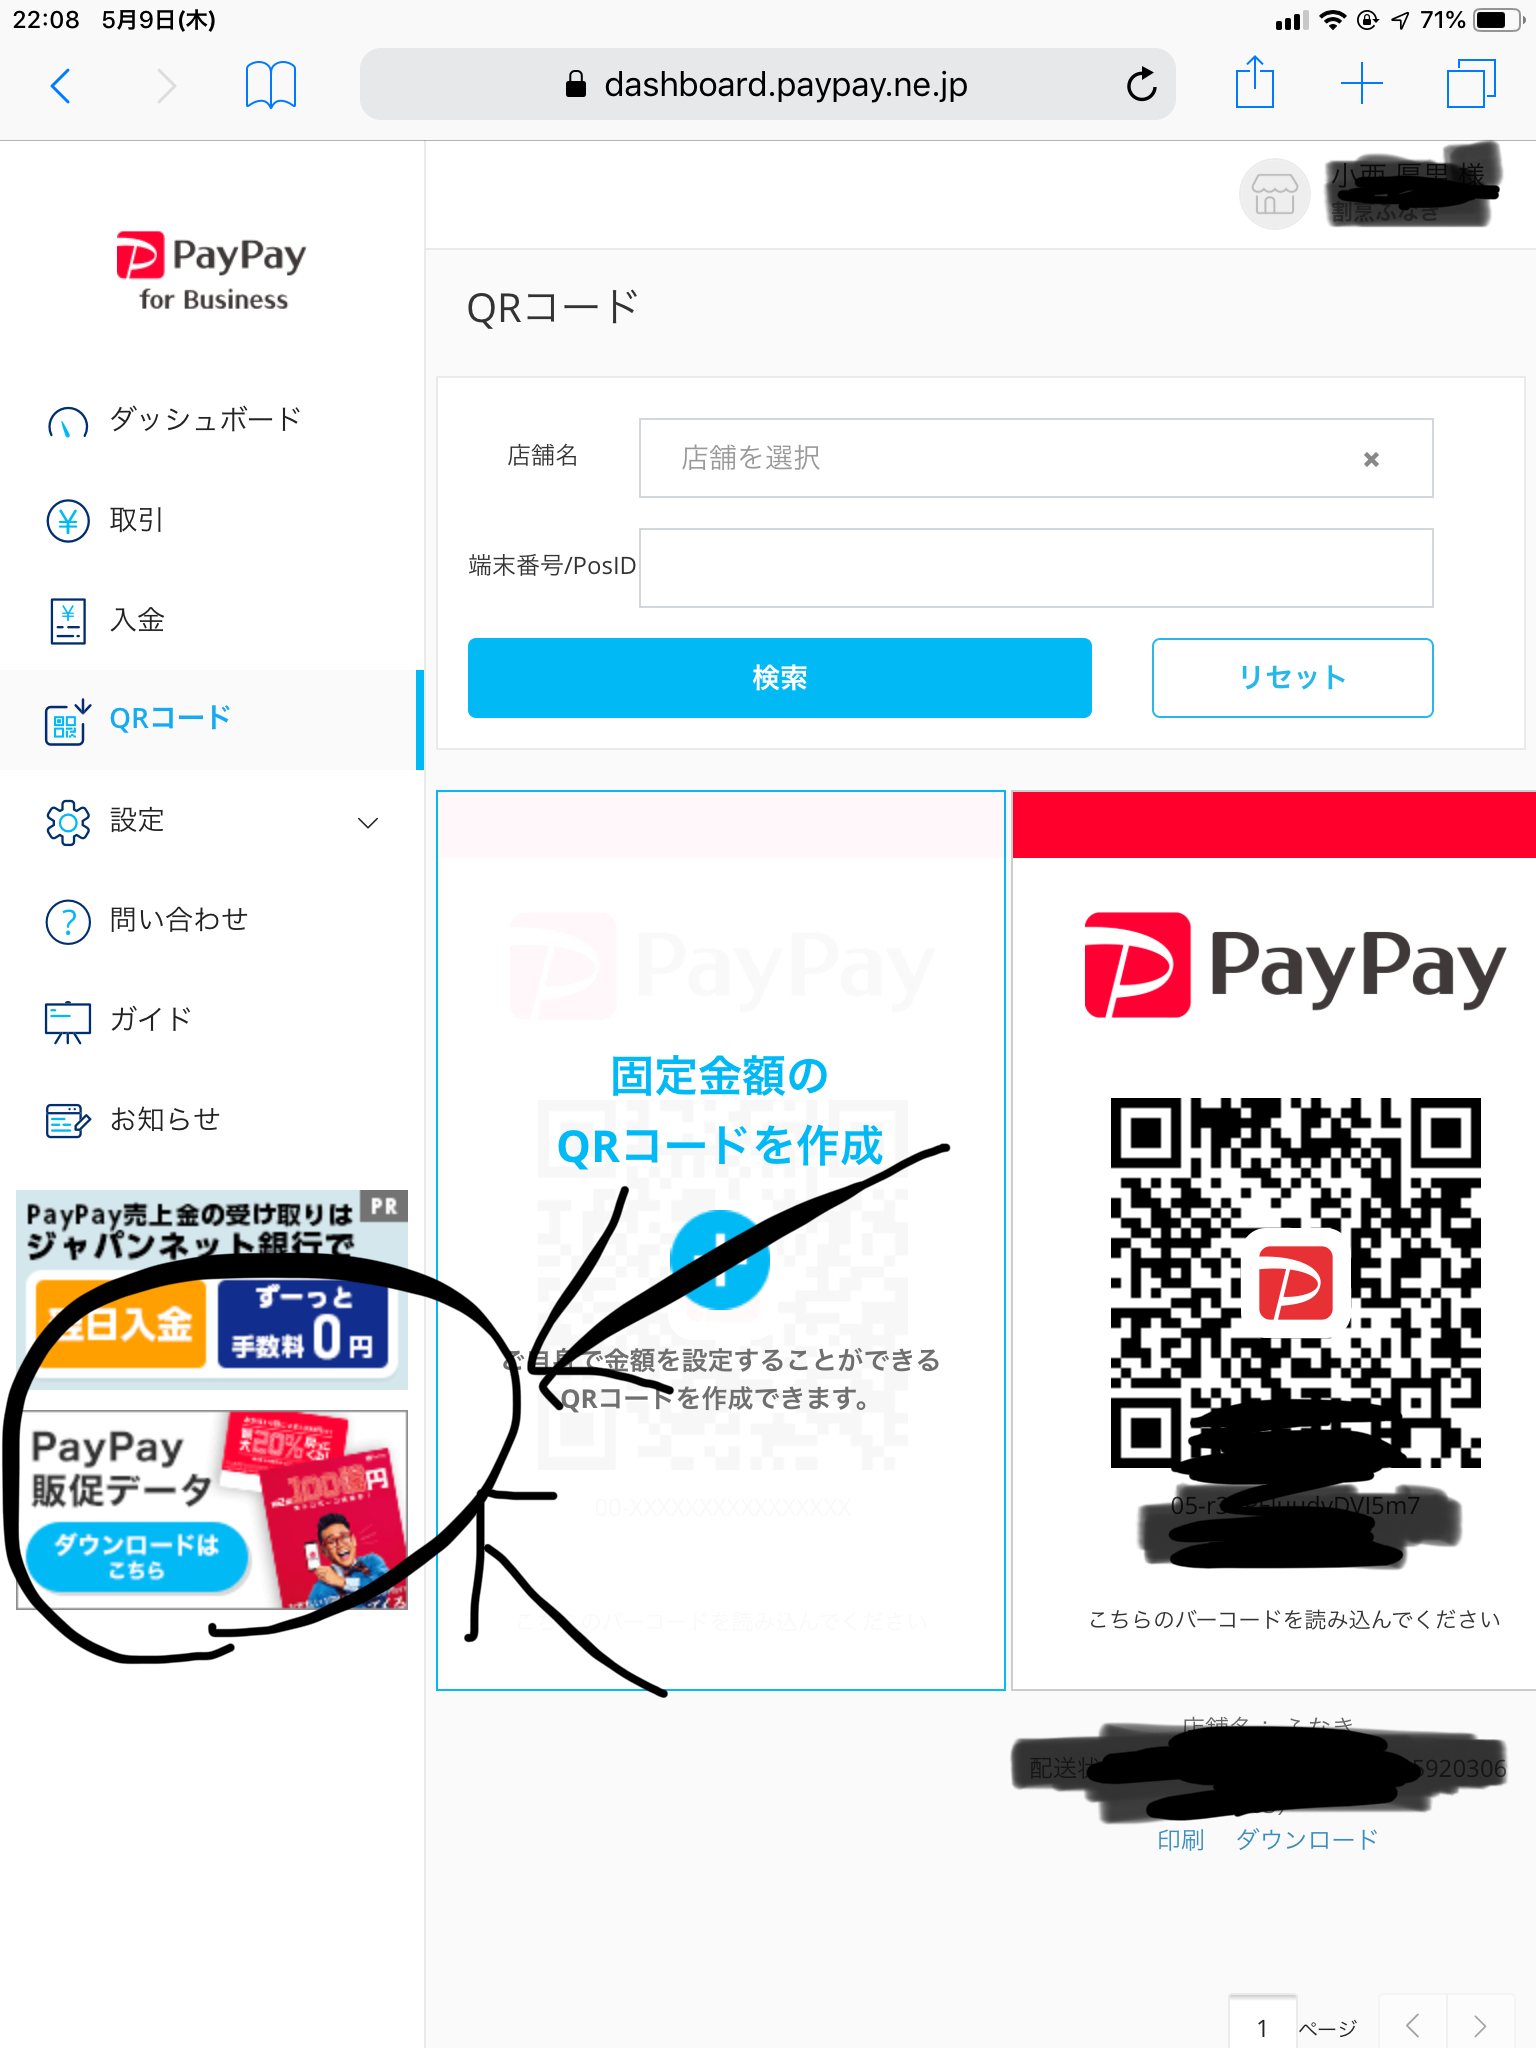 PayPayの販促データの場所